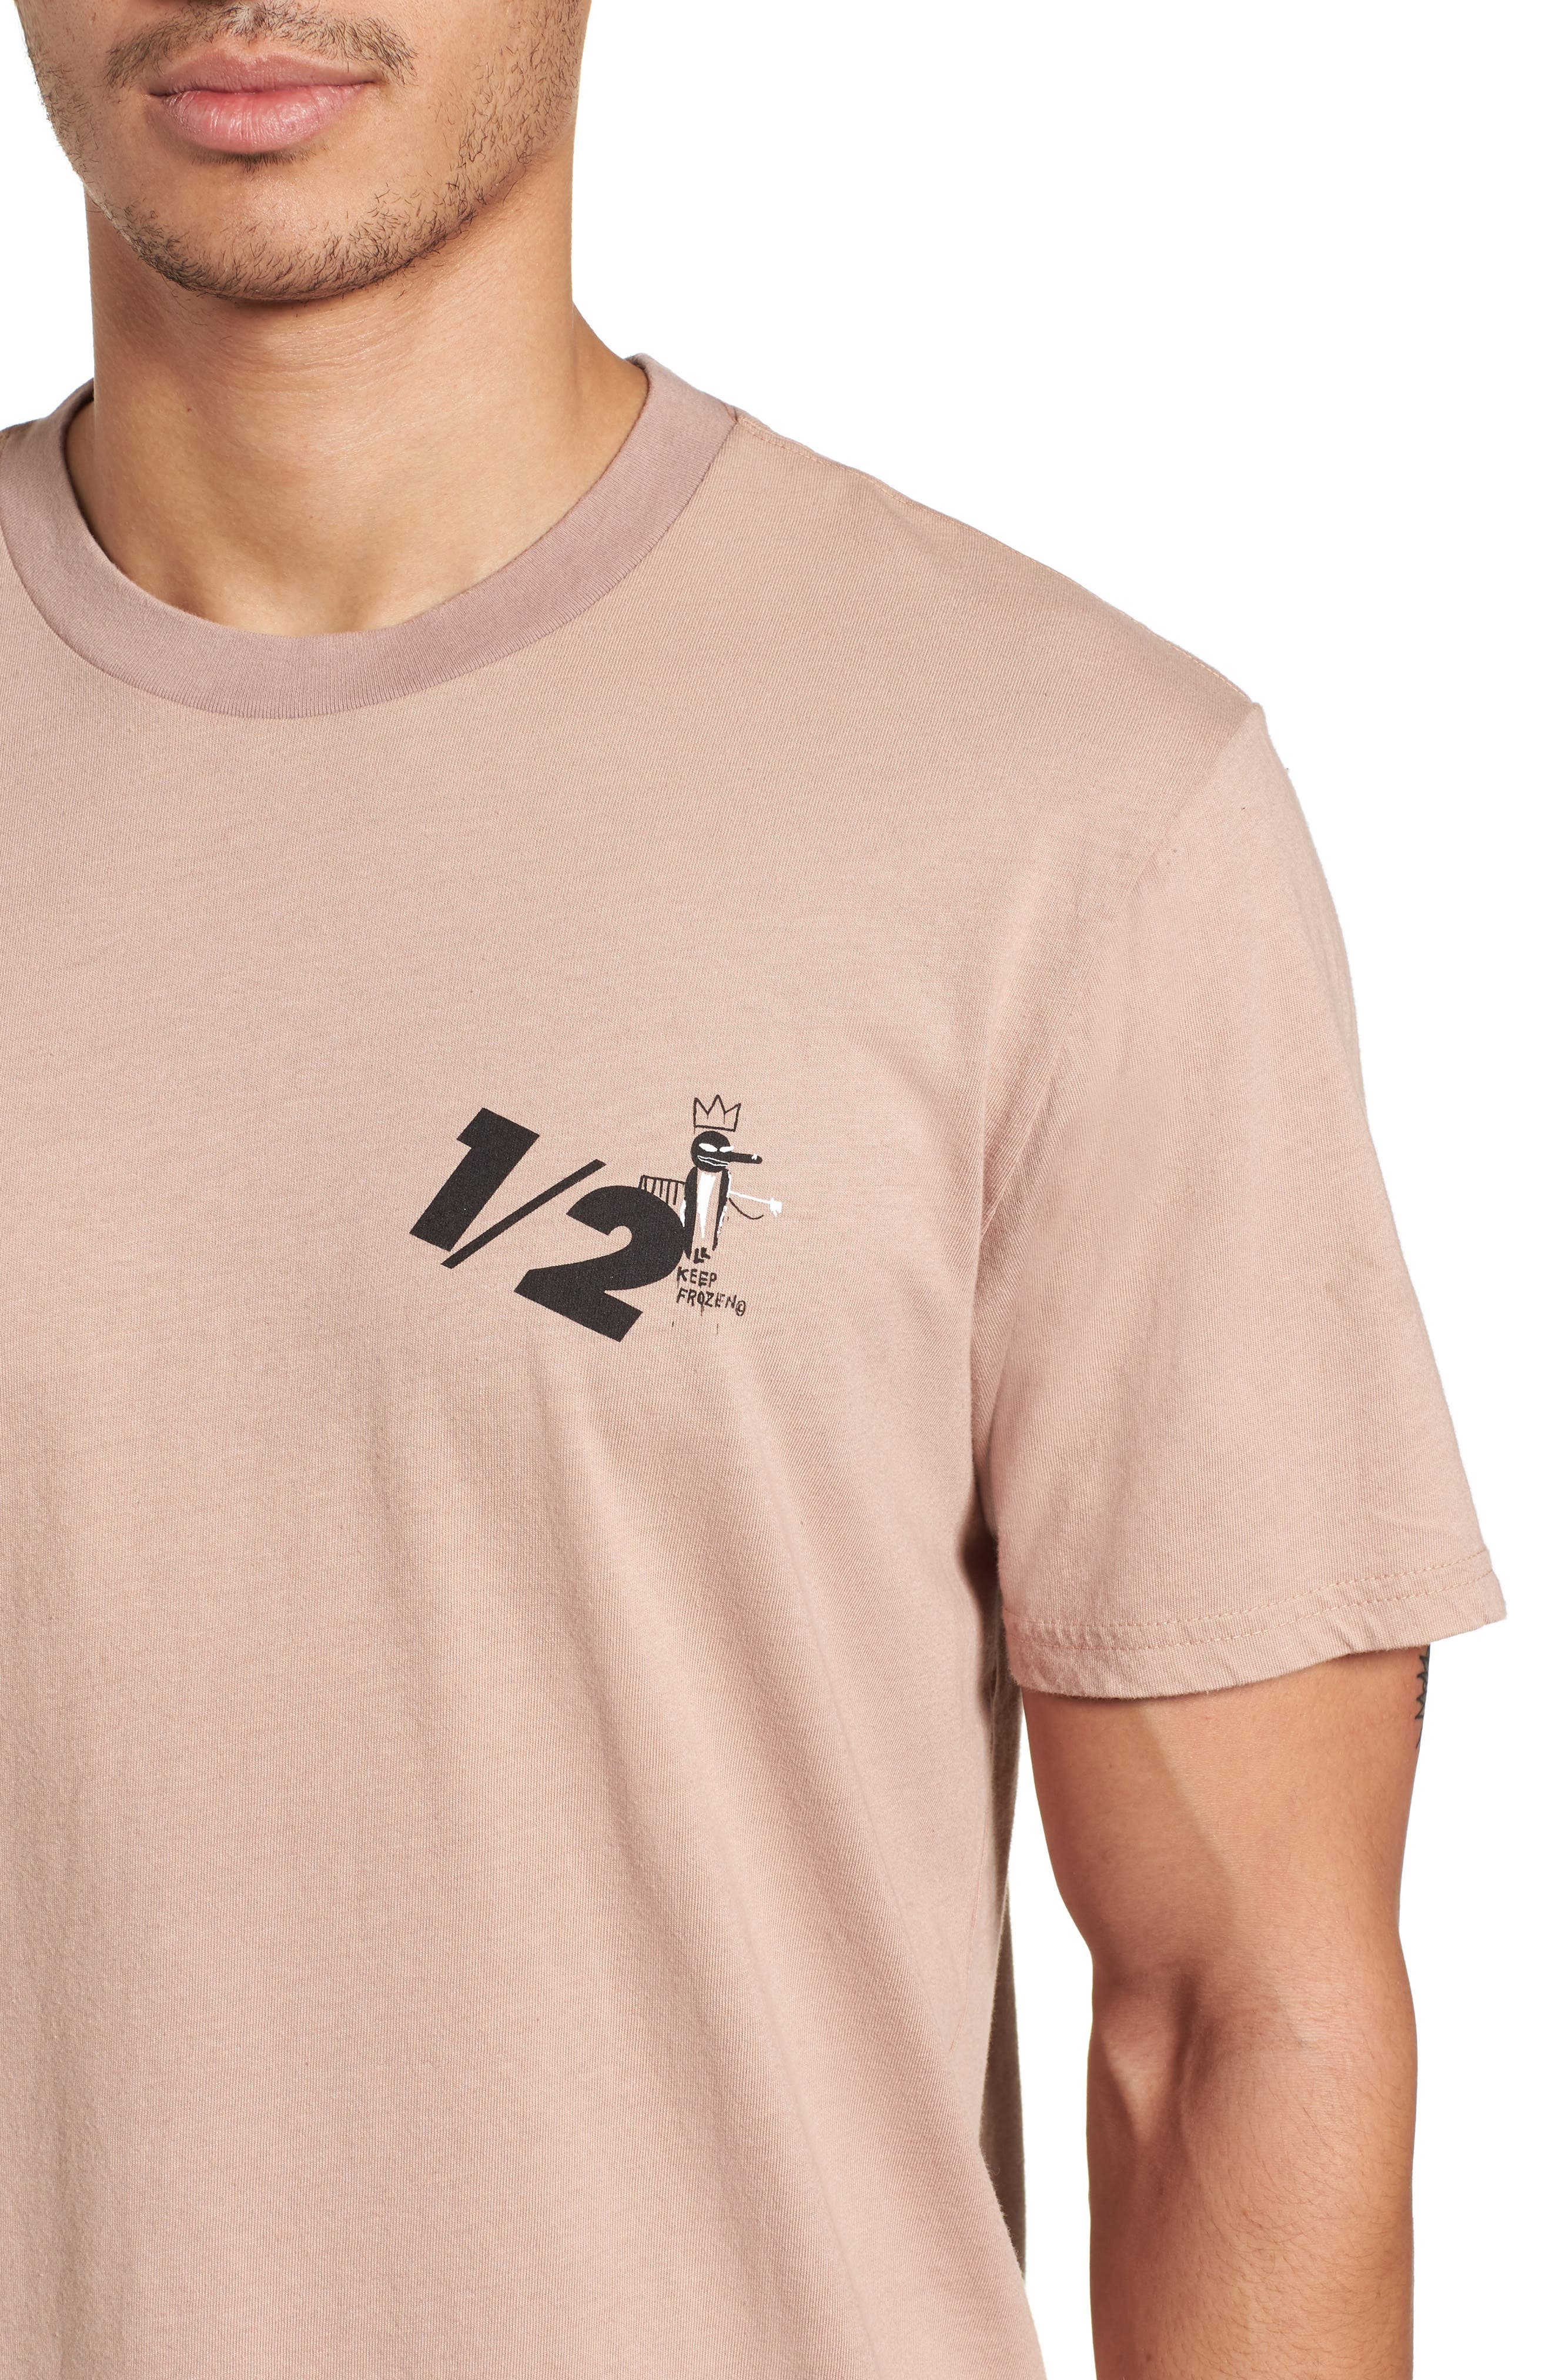 x Warhol Half T-Shirt,                             Alternate thumbnail 4, color,                             654